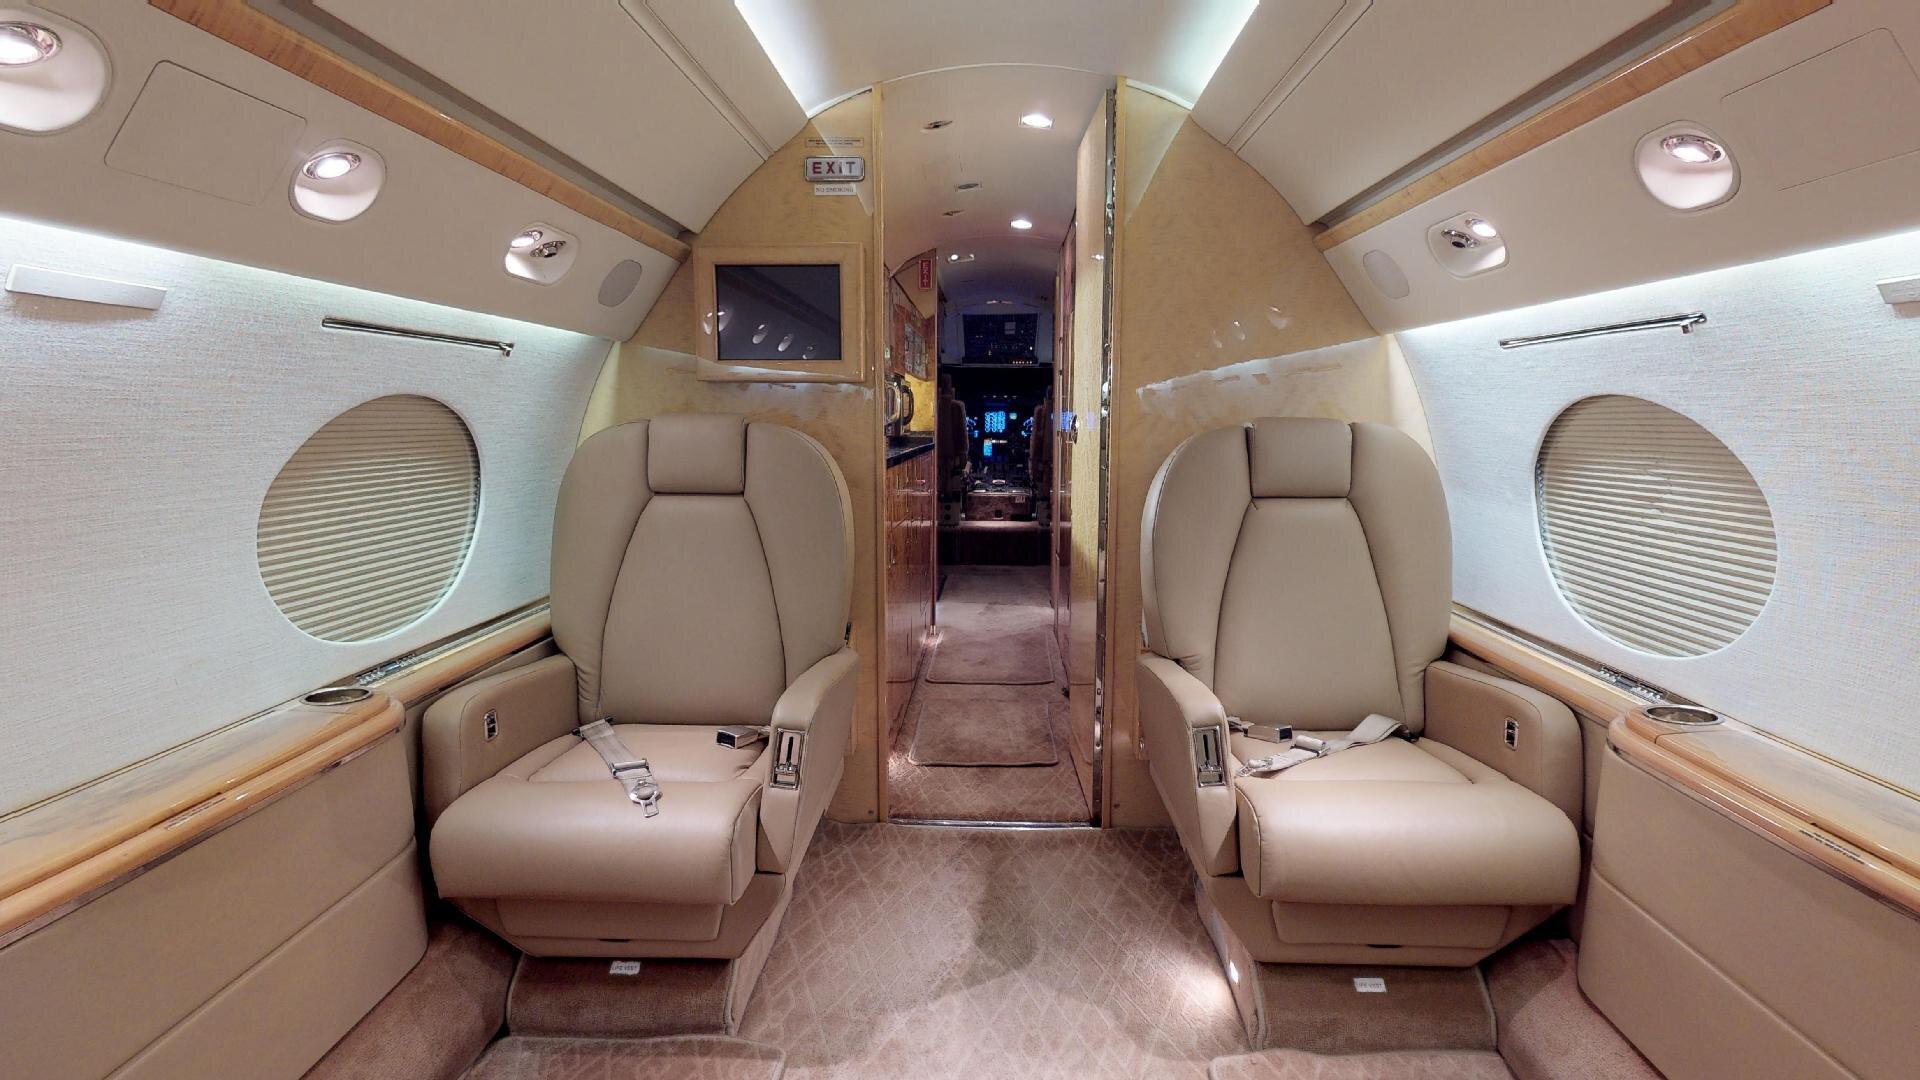 Gulfstream-V-SN-518-09232019_131841.jpg